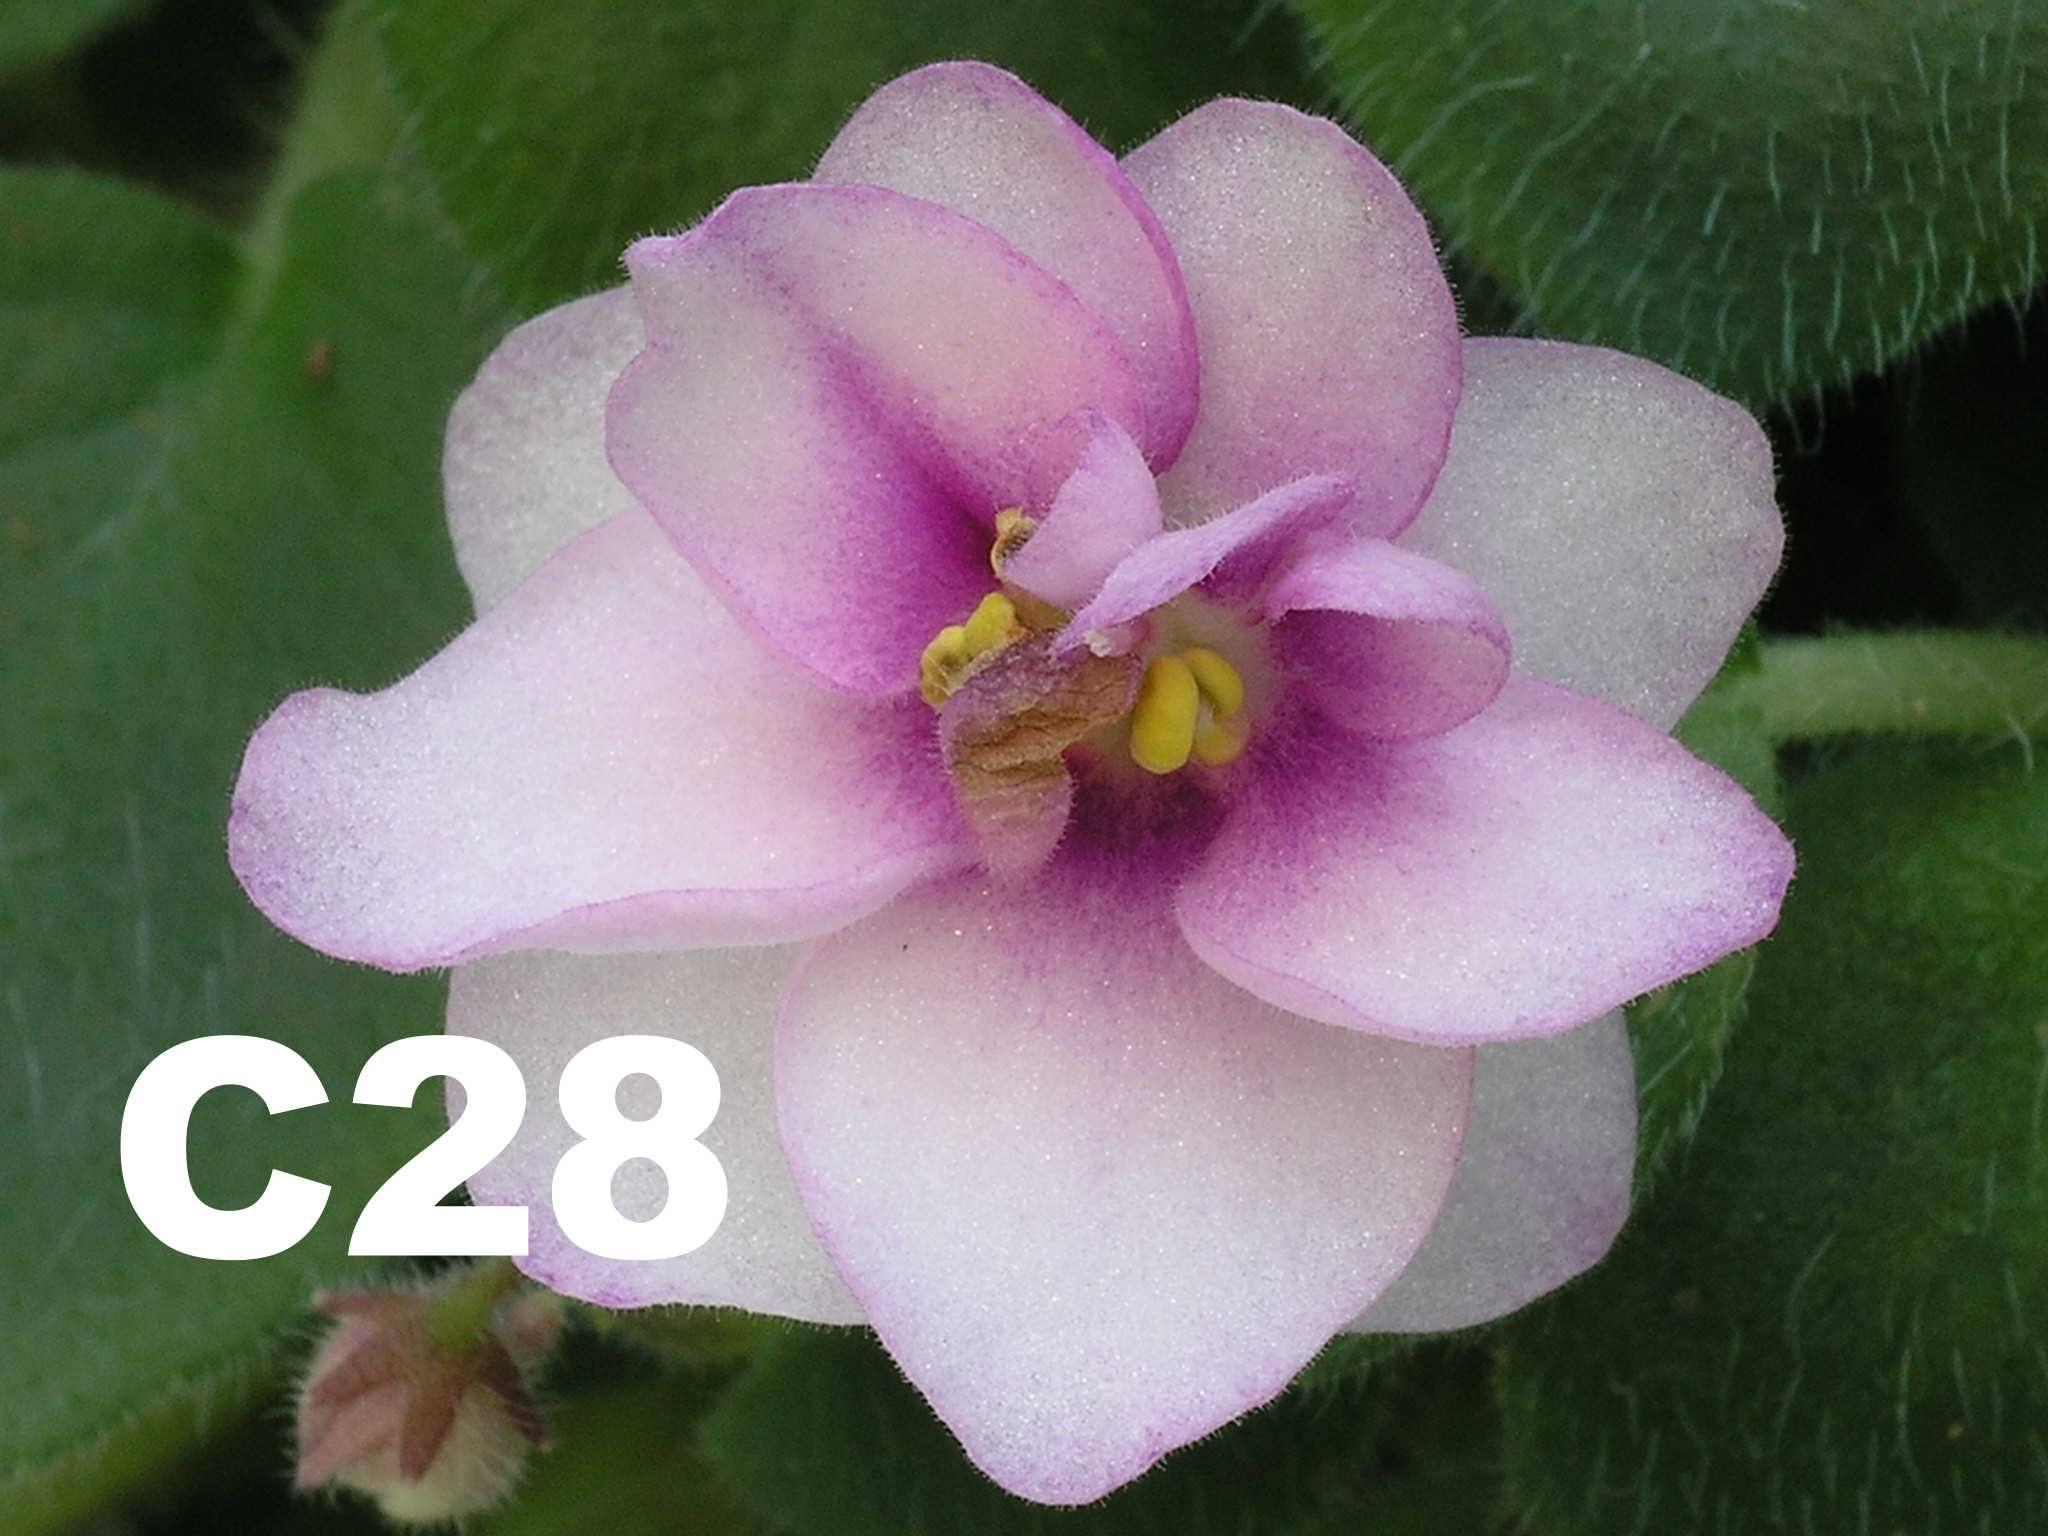 非洲紫羅蘭名錄 | African Violets Catalogue - C系列 C28